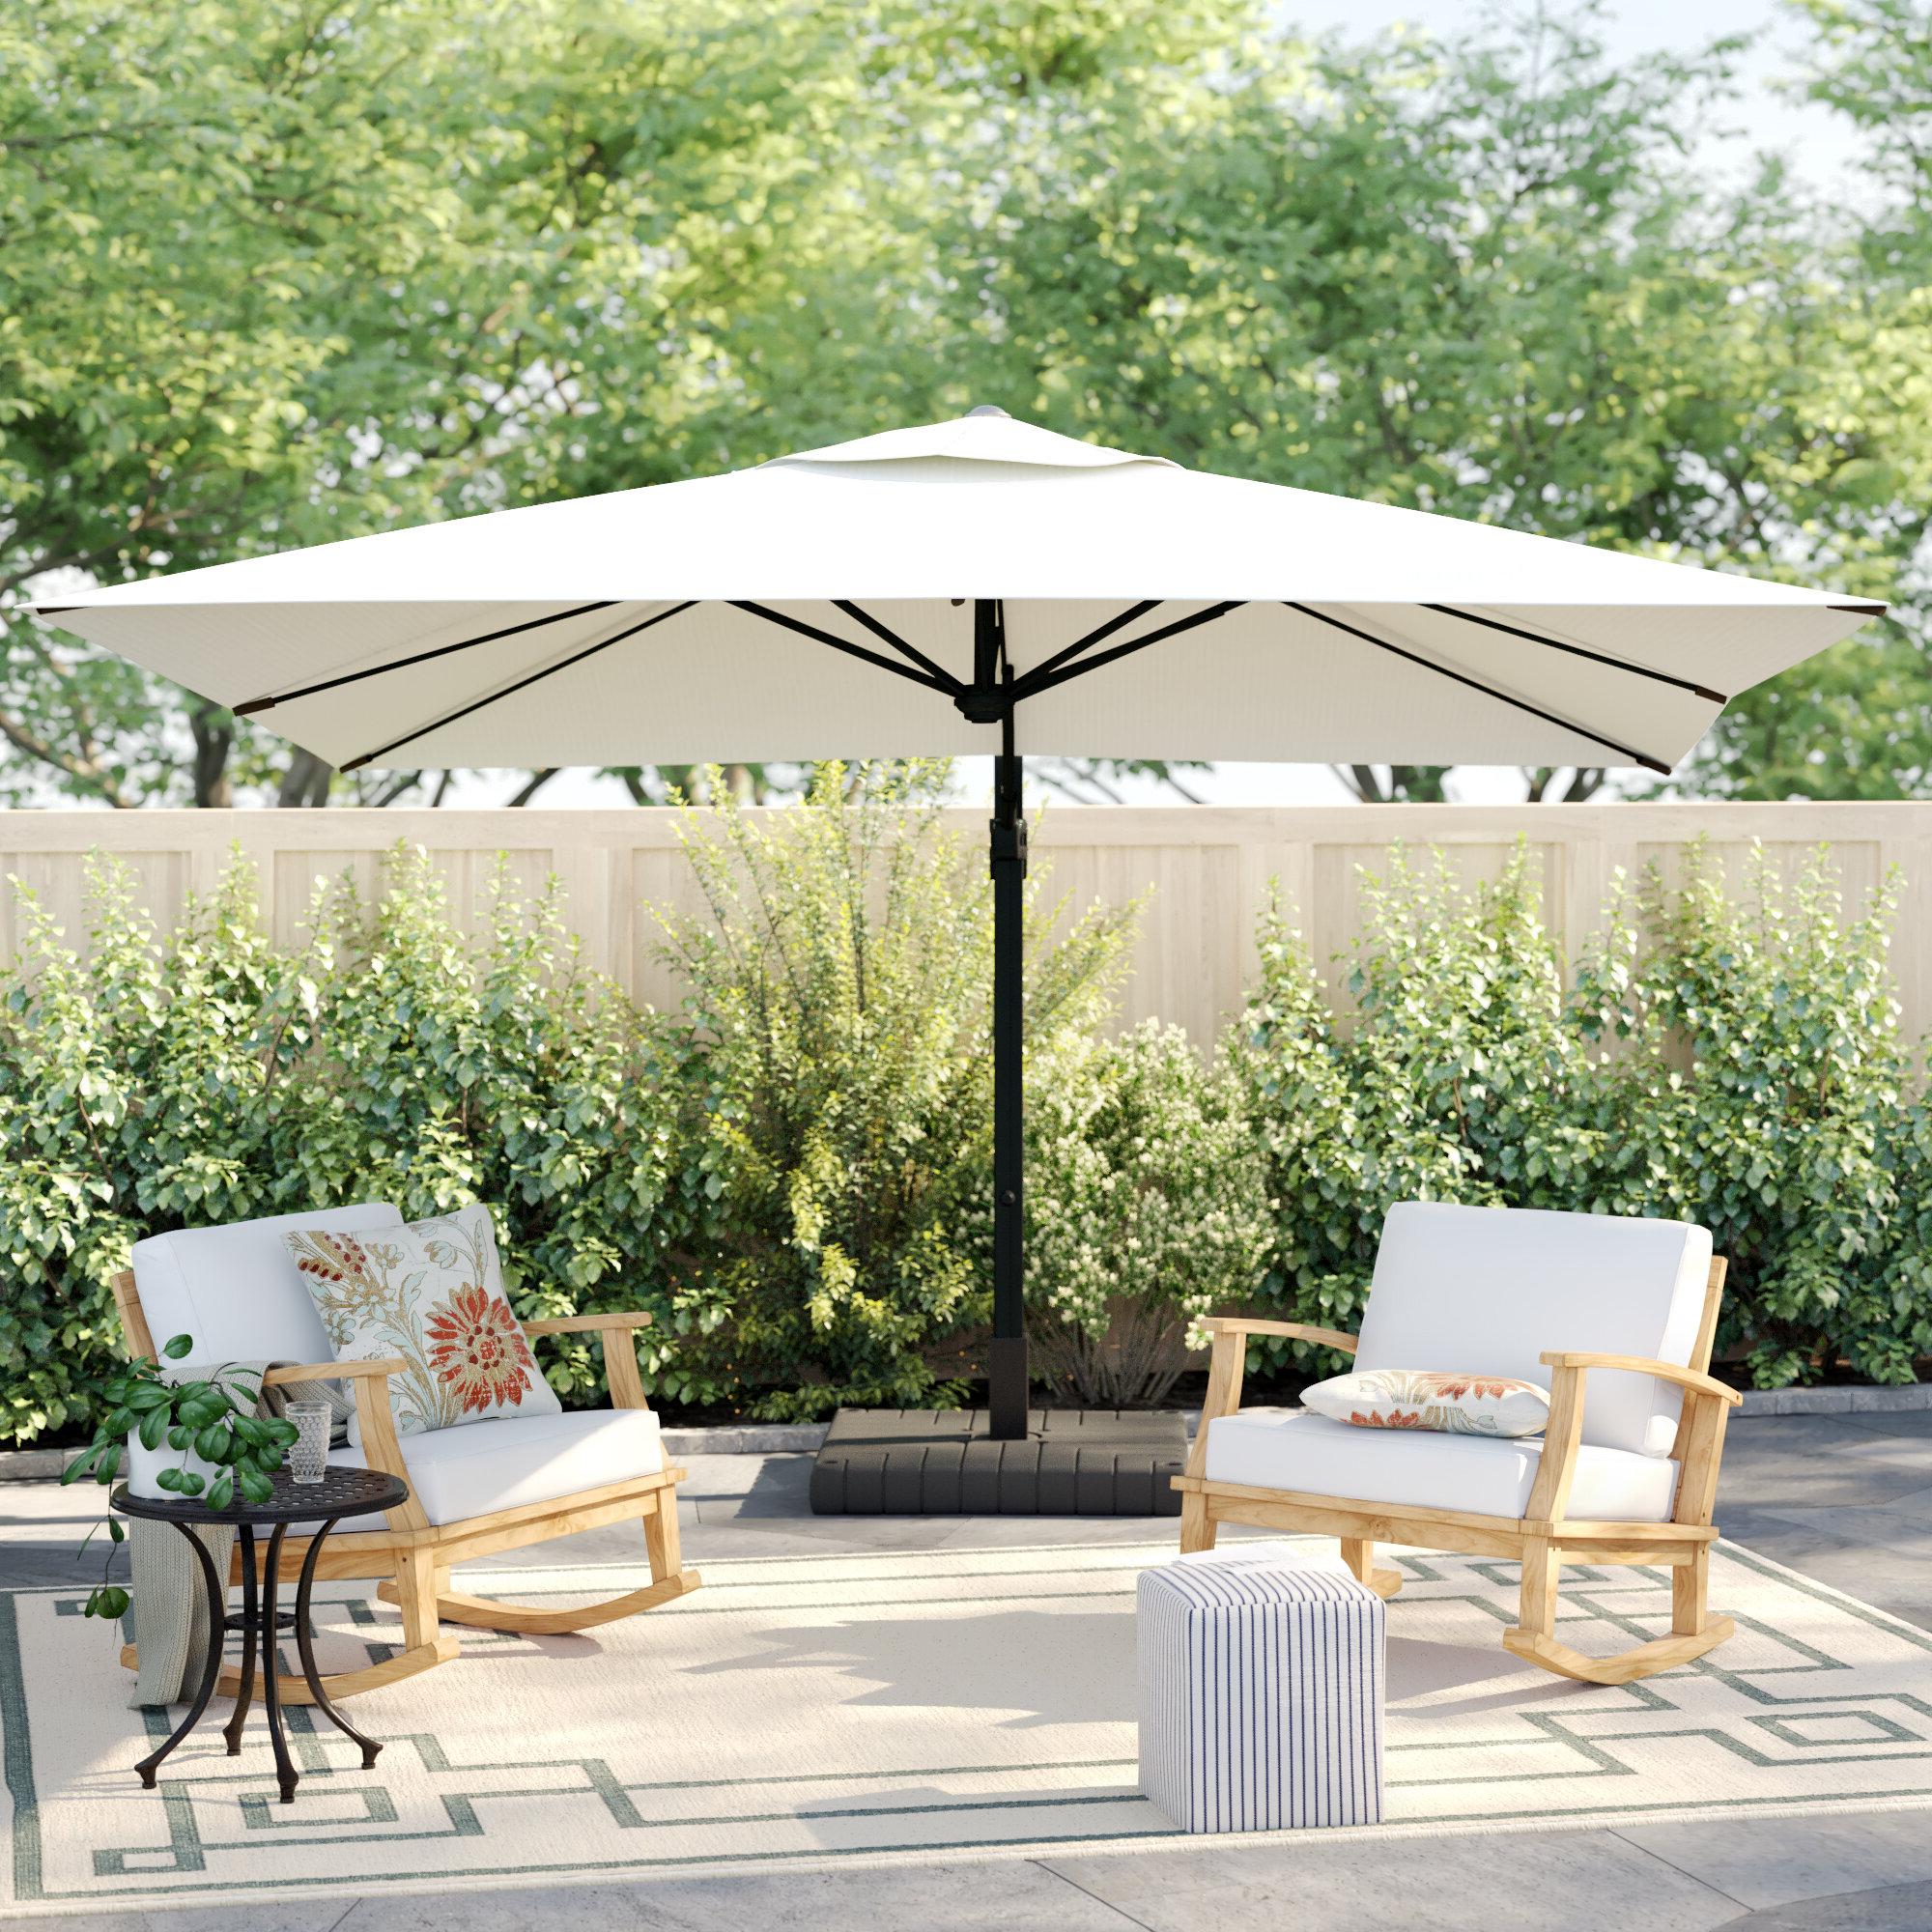 Latest Sol 72 Outdoor Carlisle 10' Square Cantilever Sunbrella Umbrella For Krystal Square Cantilever Sunbrella Umbrellas (View 6 of 20)